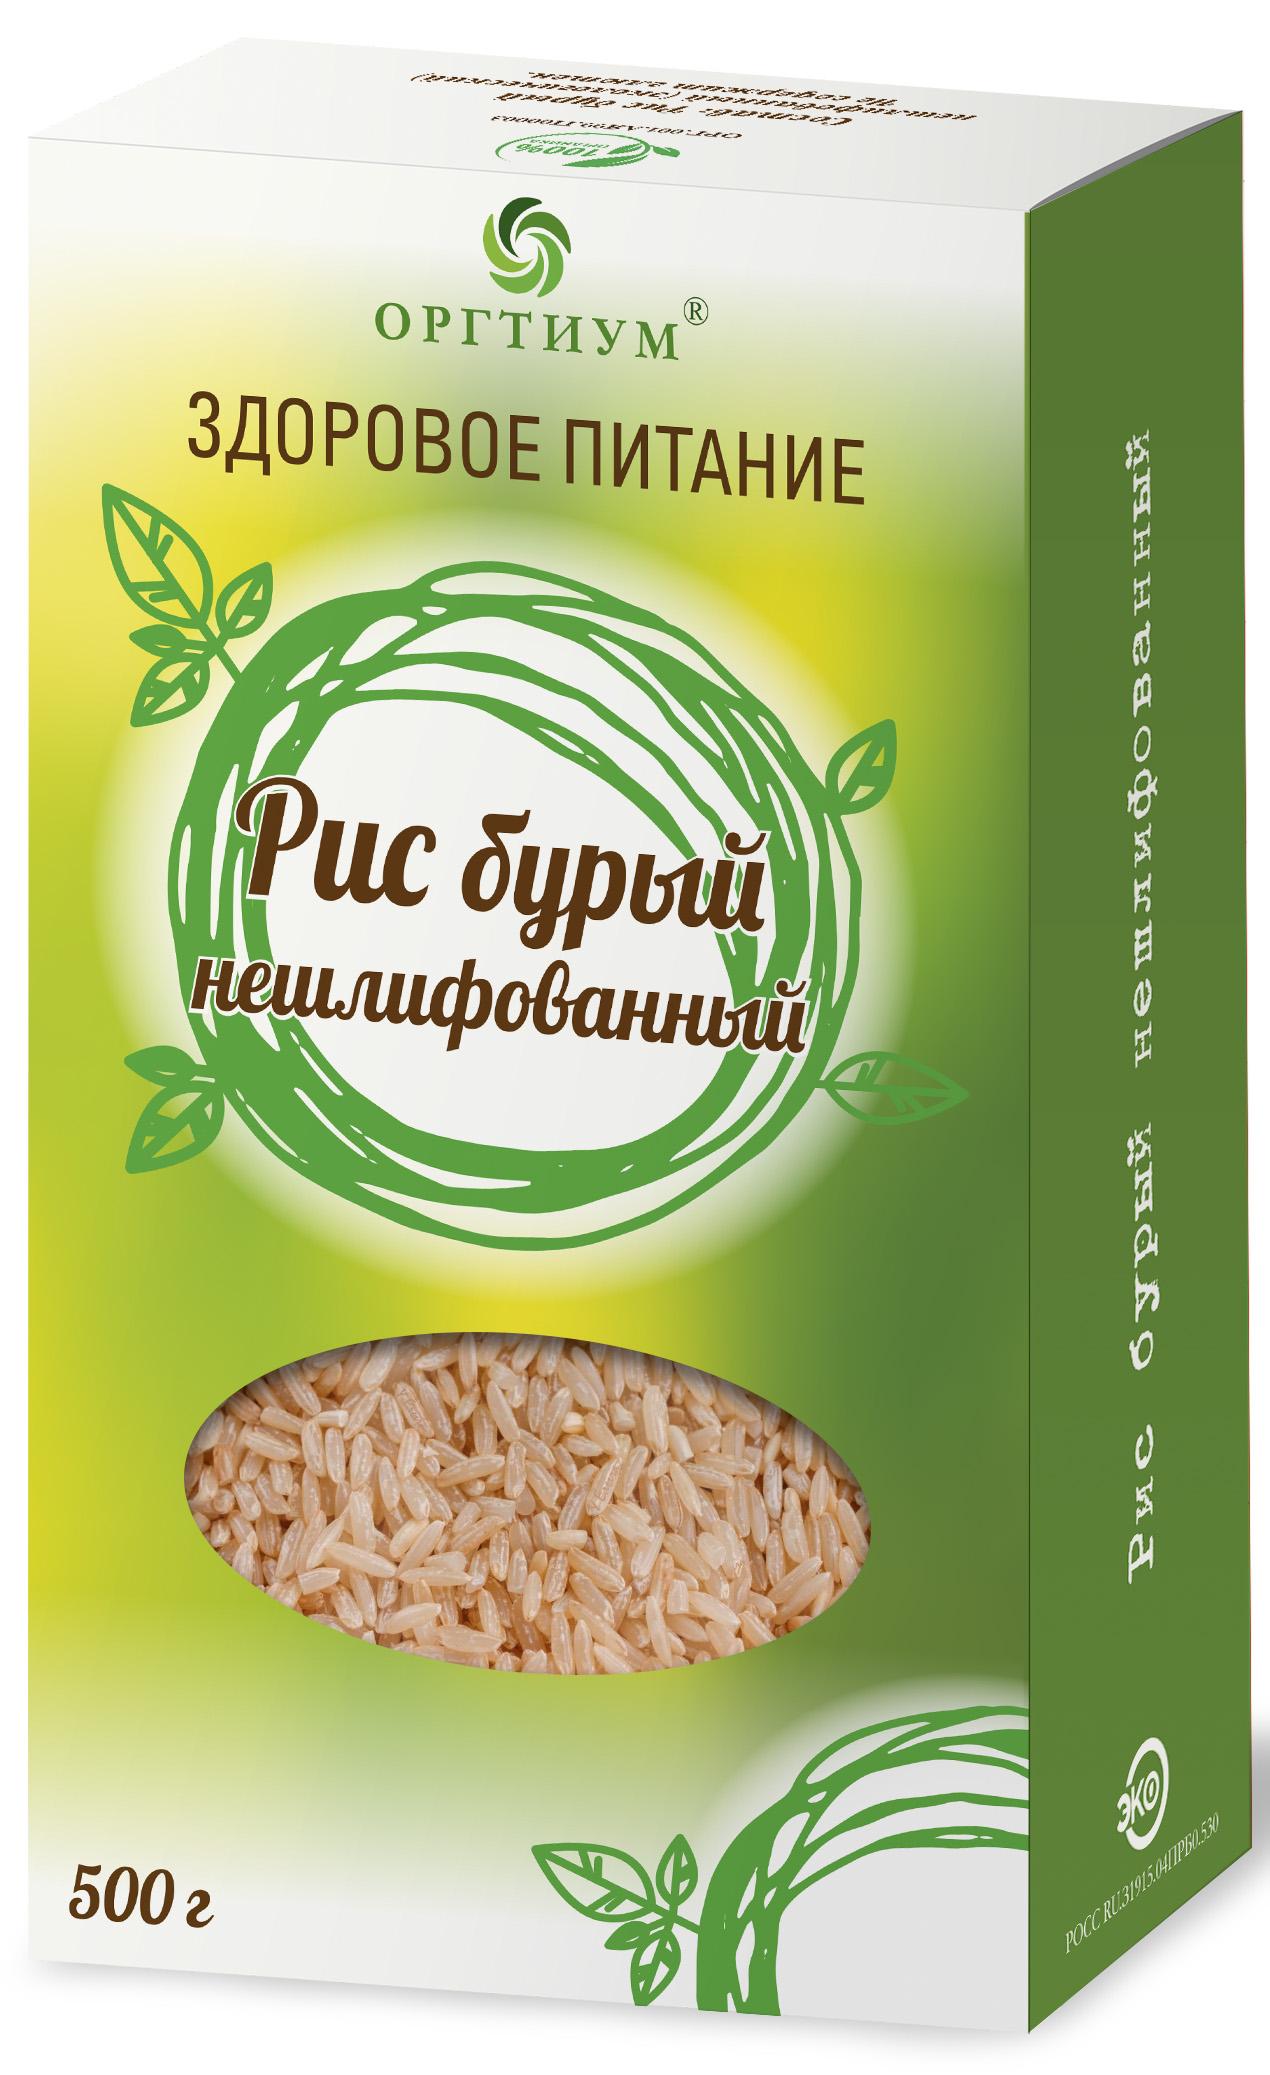 Рис бурый нешлифованый экологический, 500 гр, Оргтиум фото